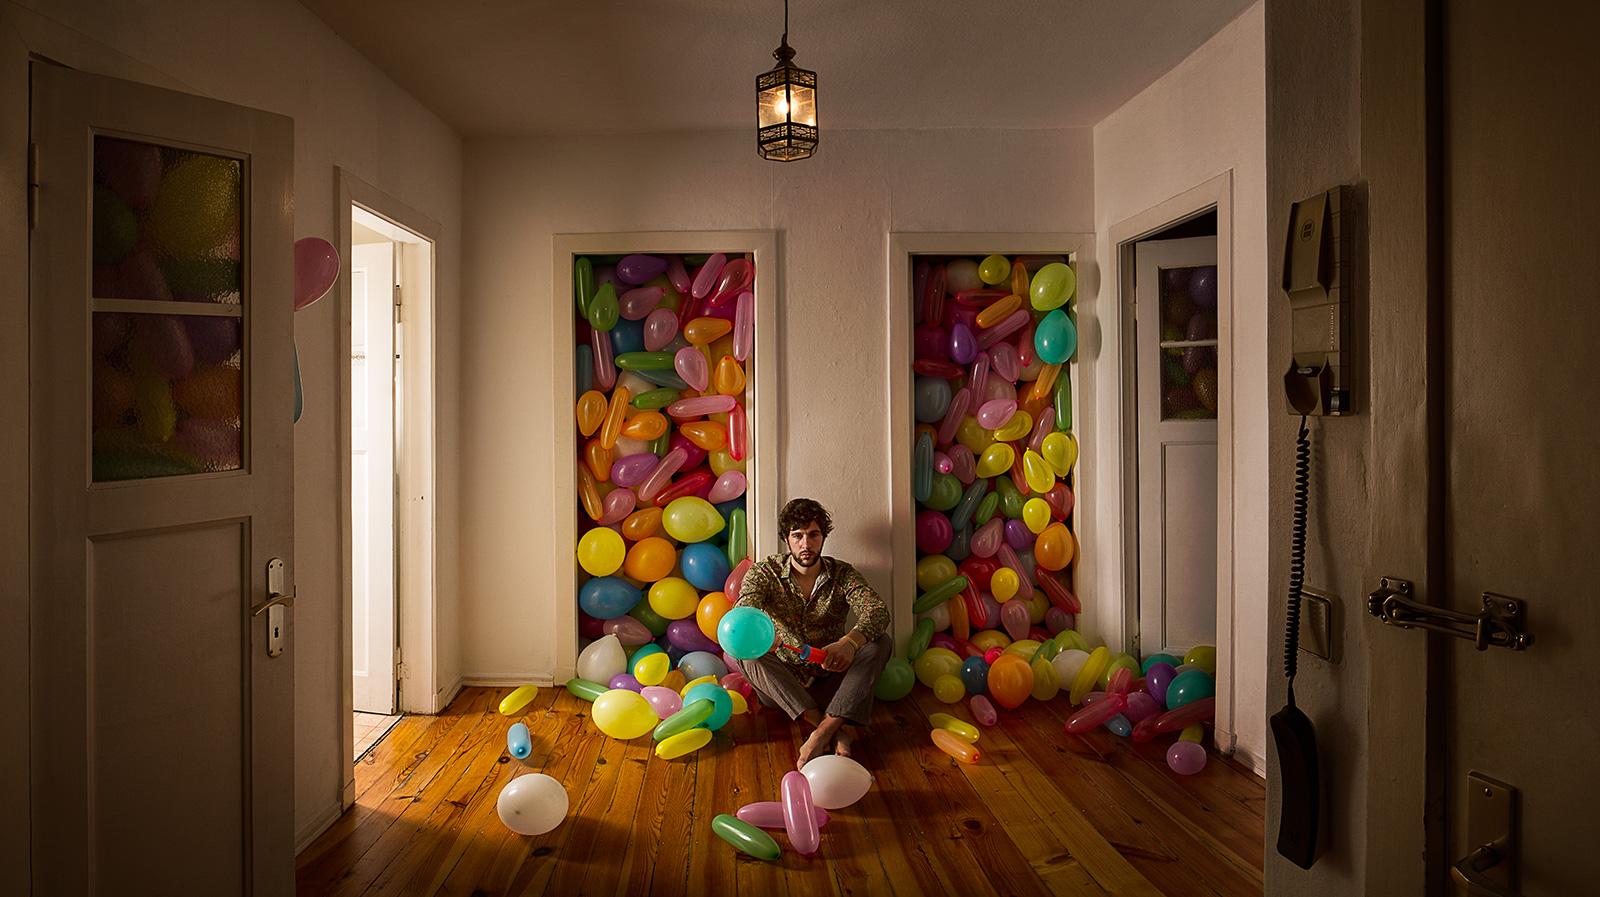 Seb Agnew – Balloons